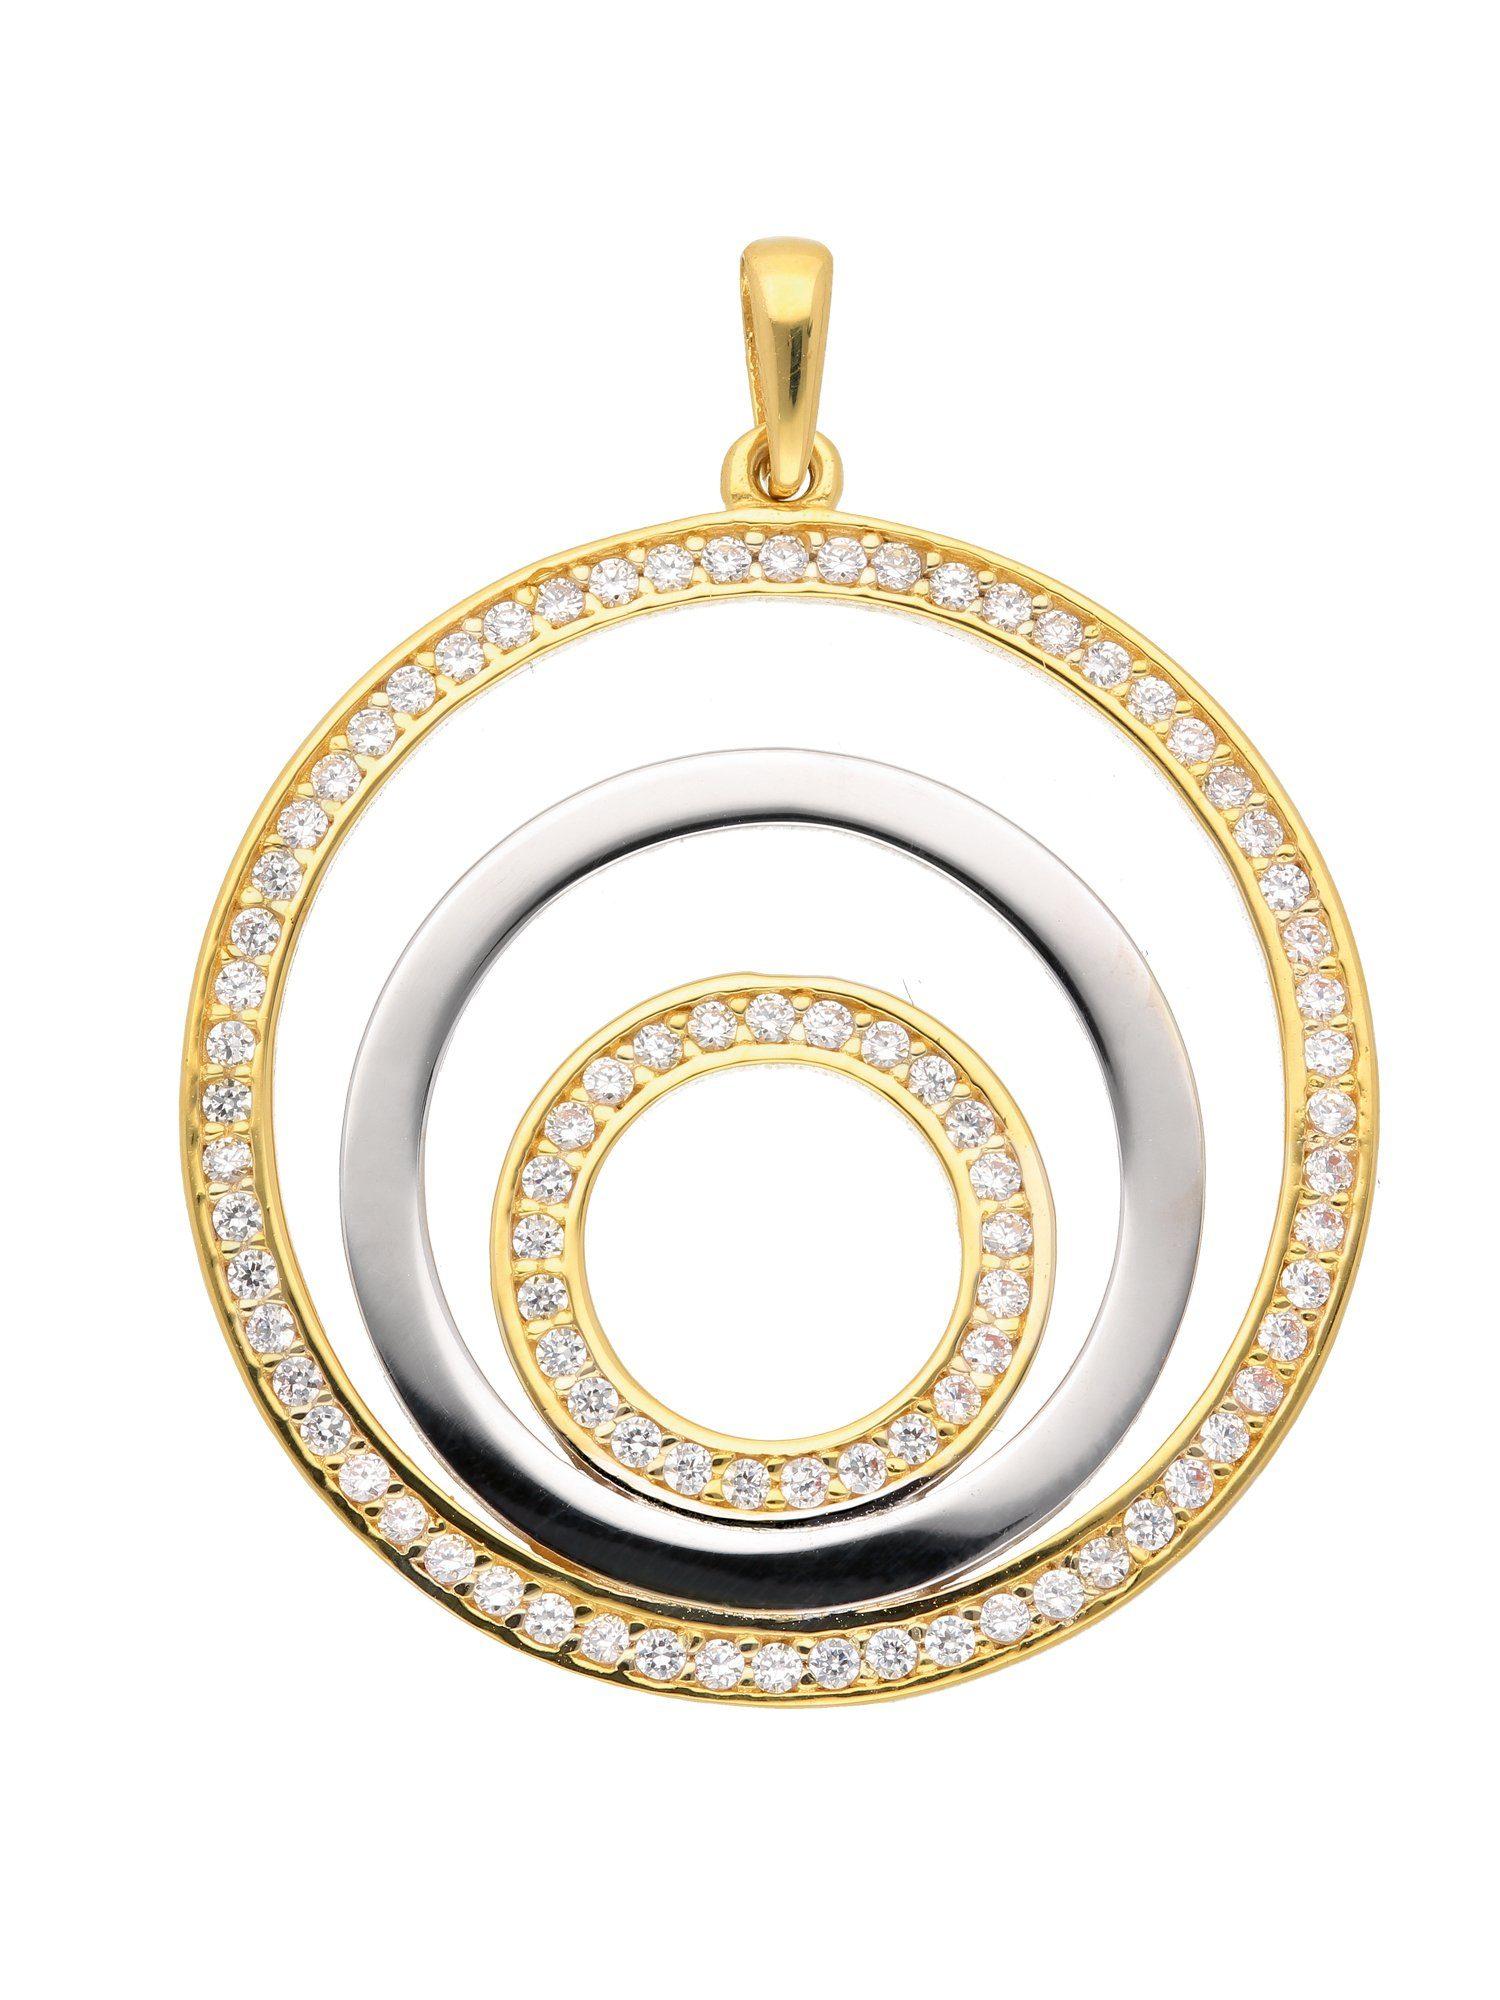 Adelia´s Kettenanhänger »Gold Anhänger« 8 k 333 Gelbgold mit Zirkonia